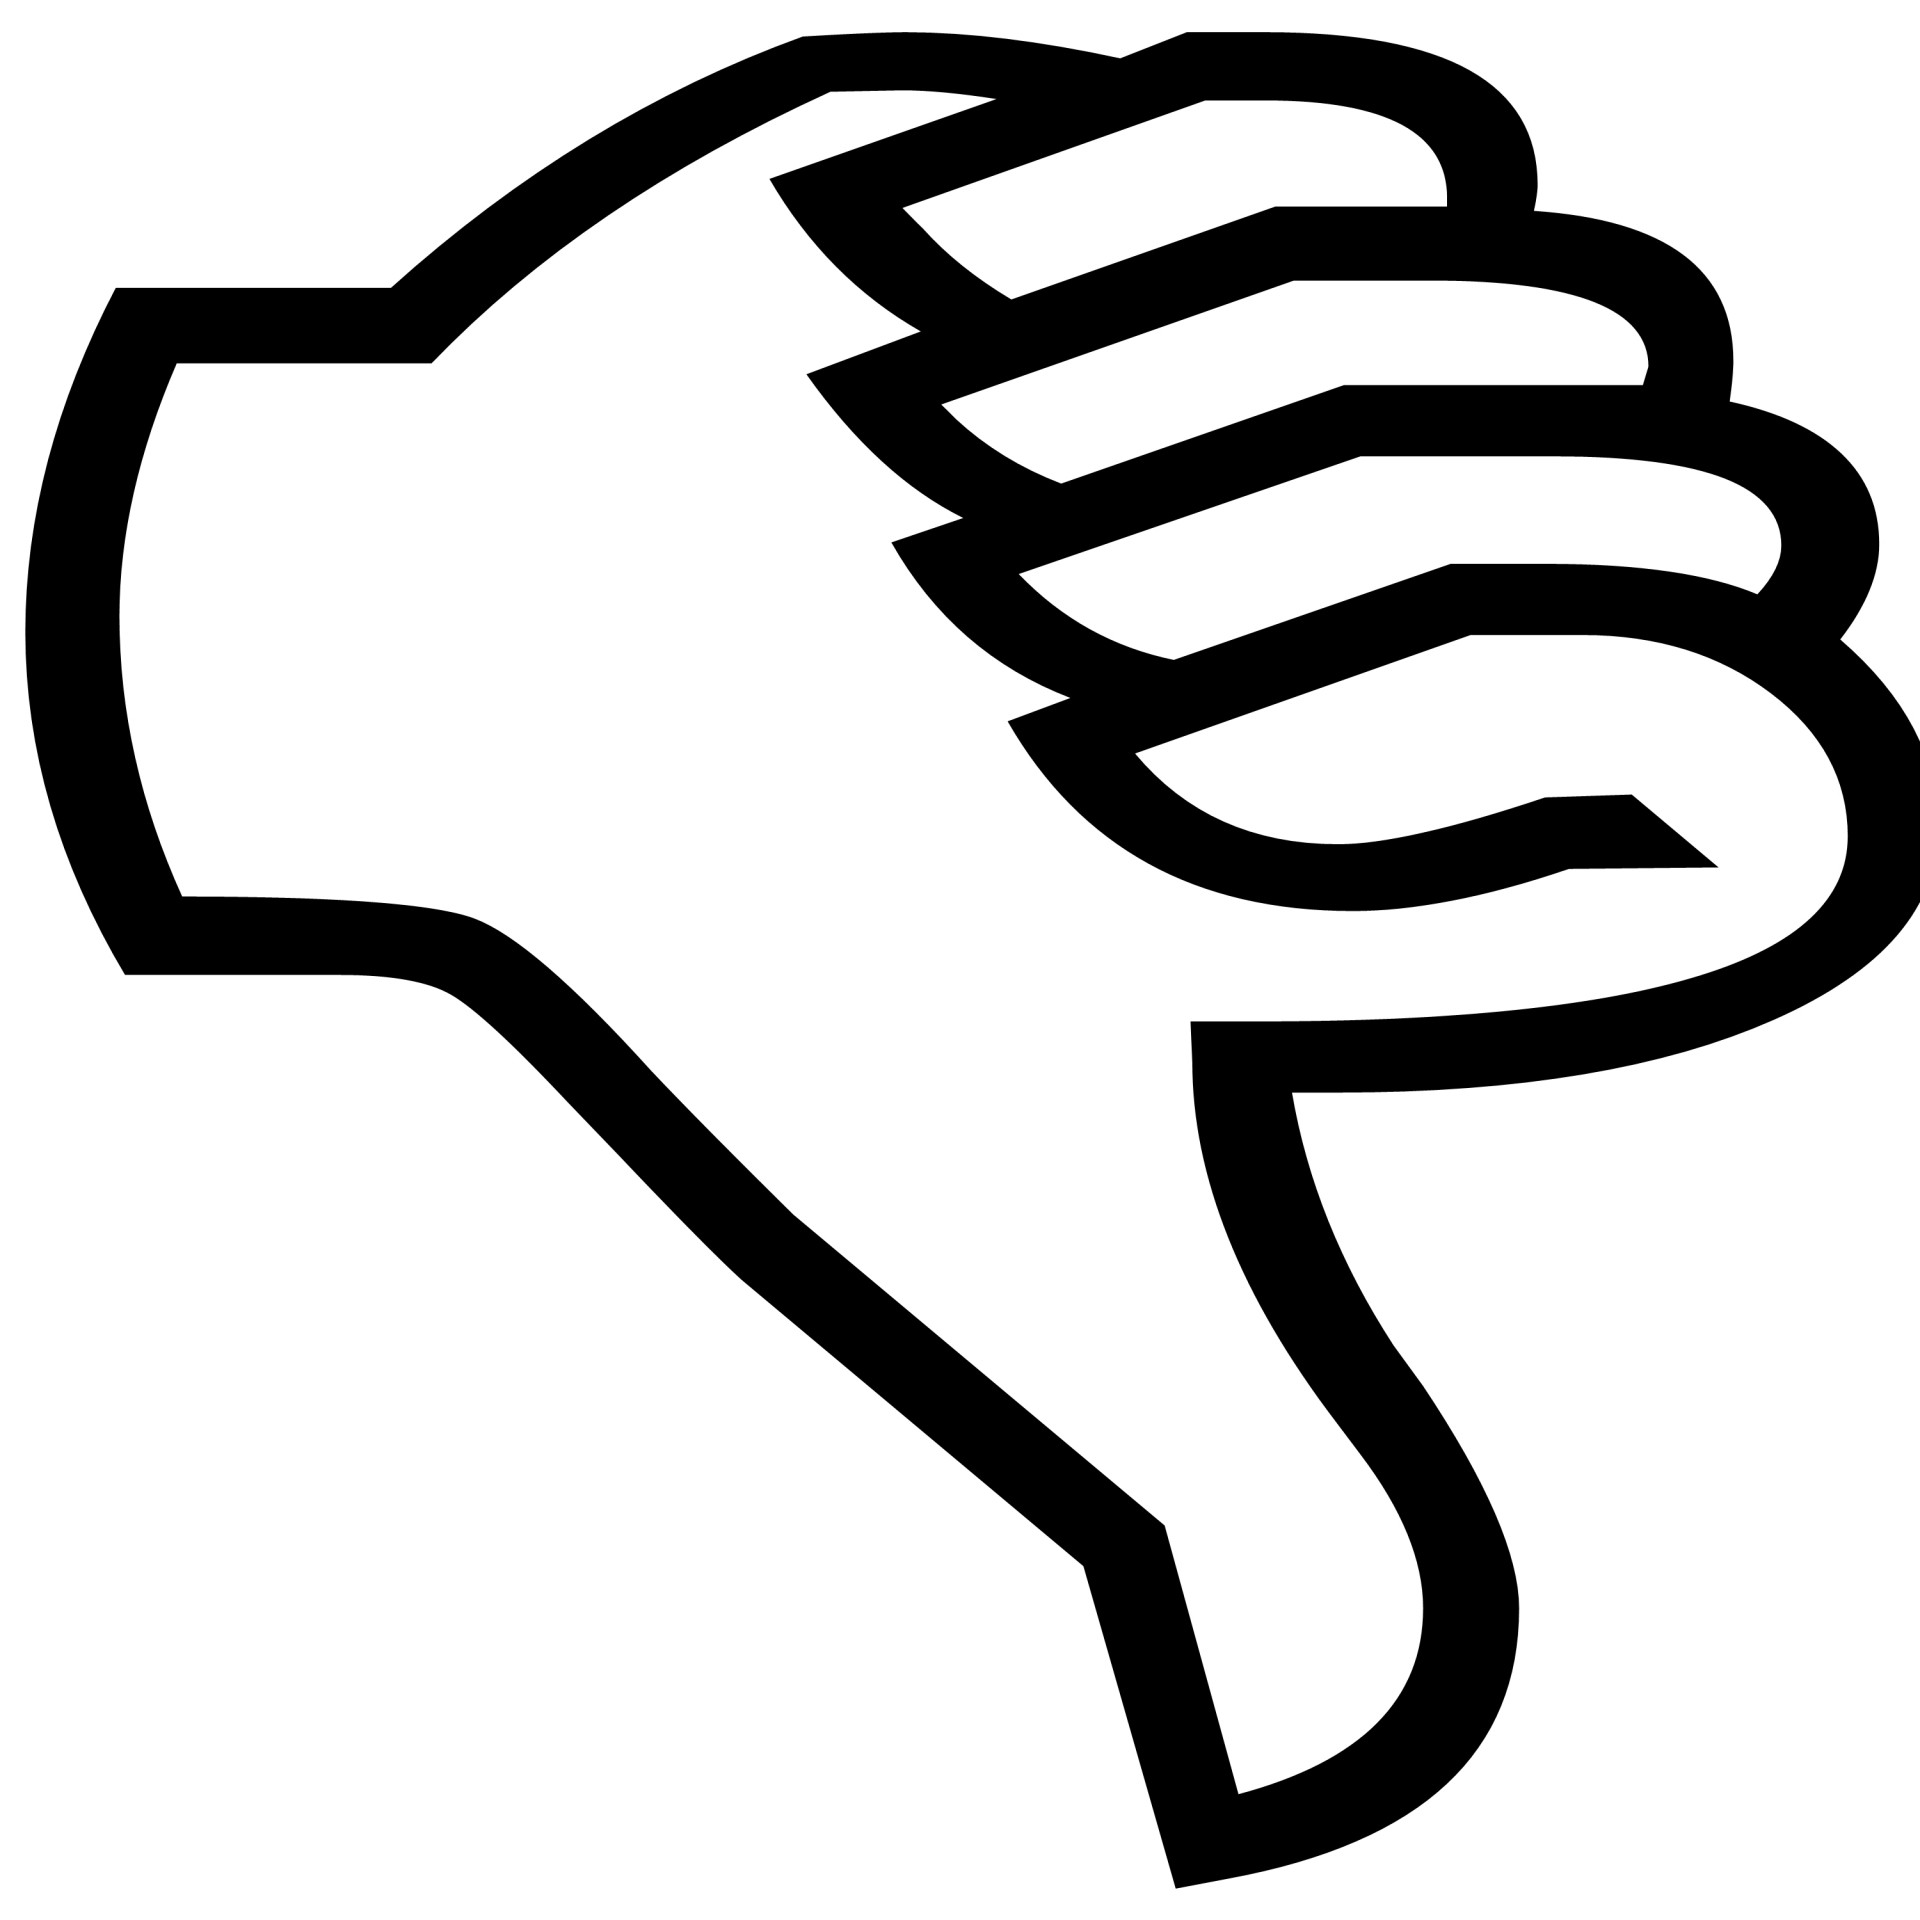 Thumb Down Silhouette Free Stock Photo